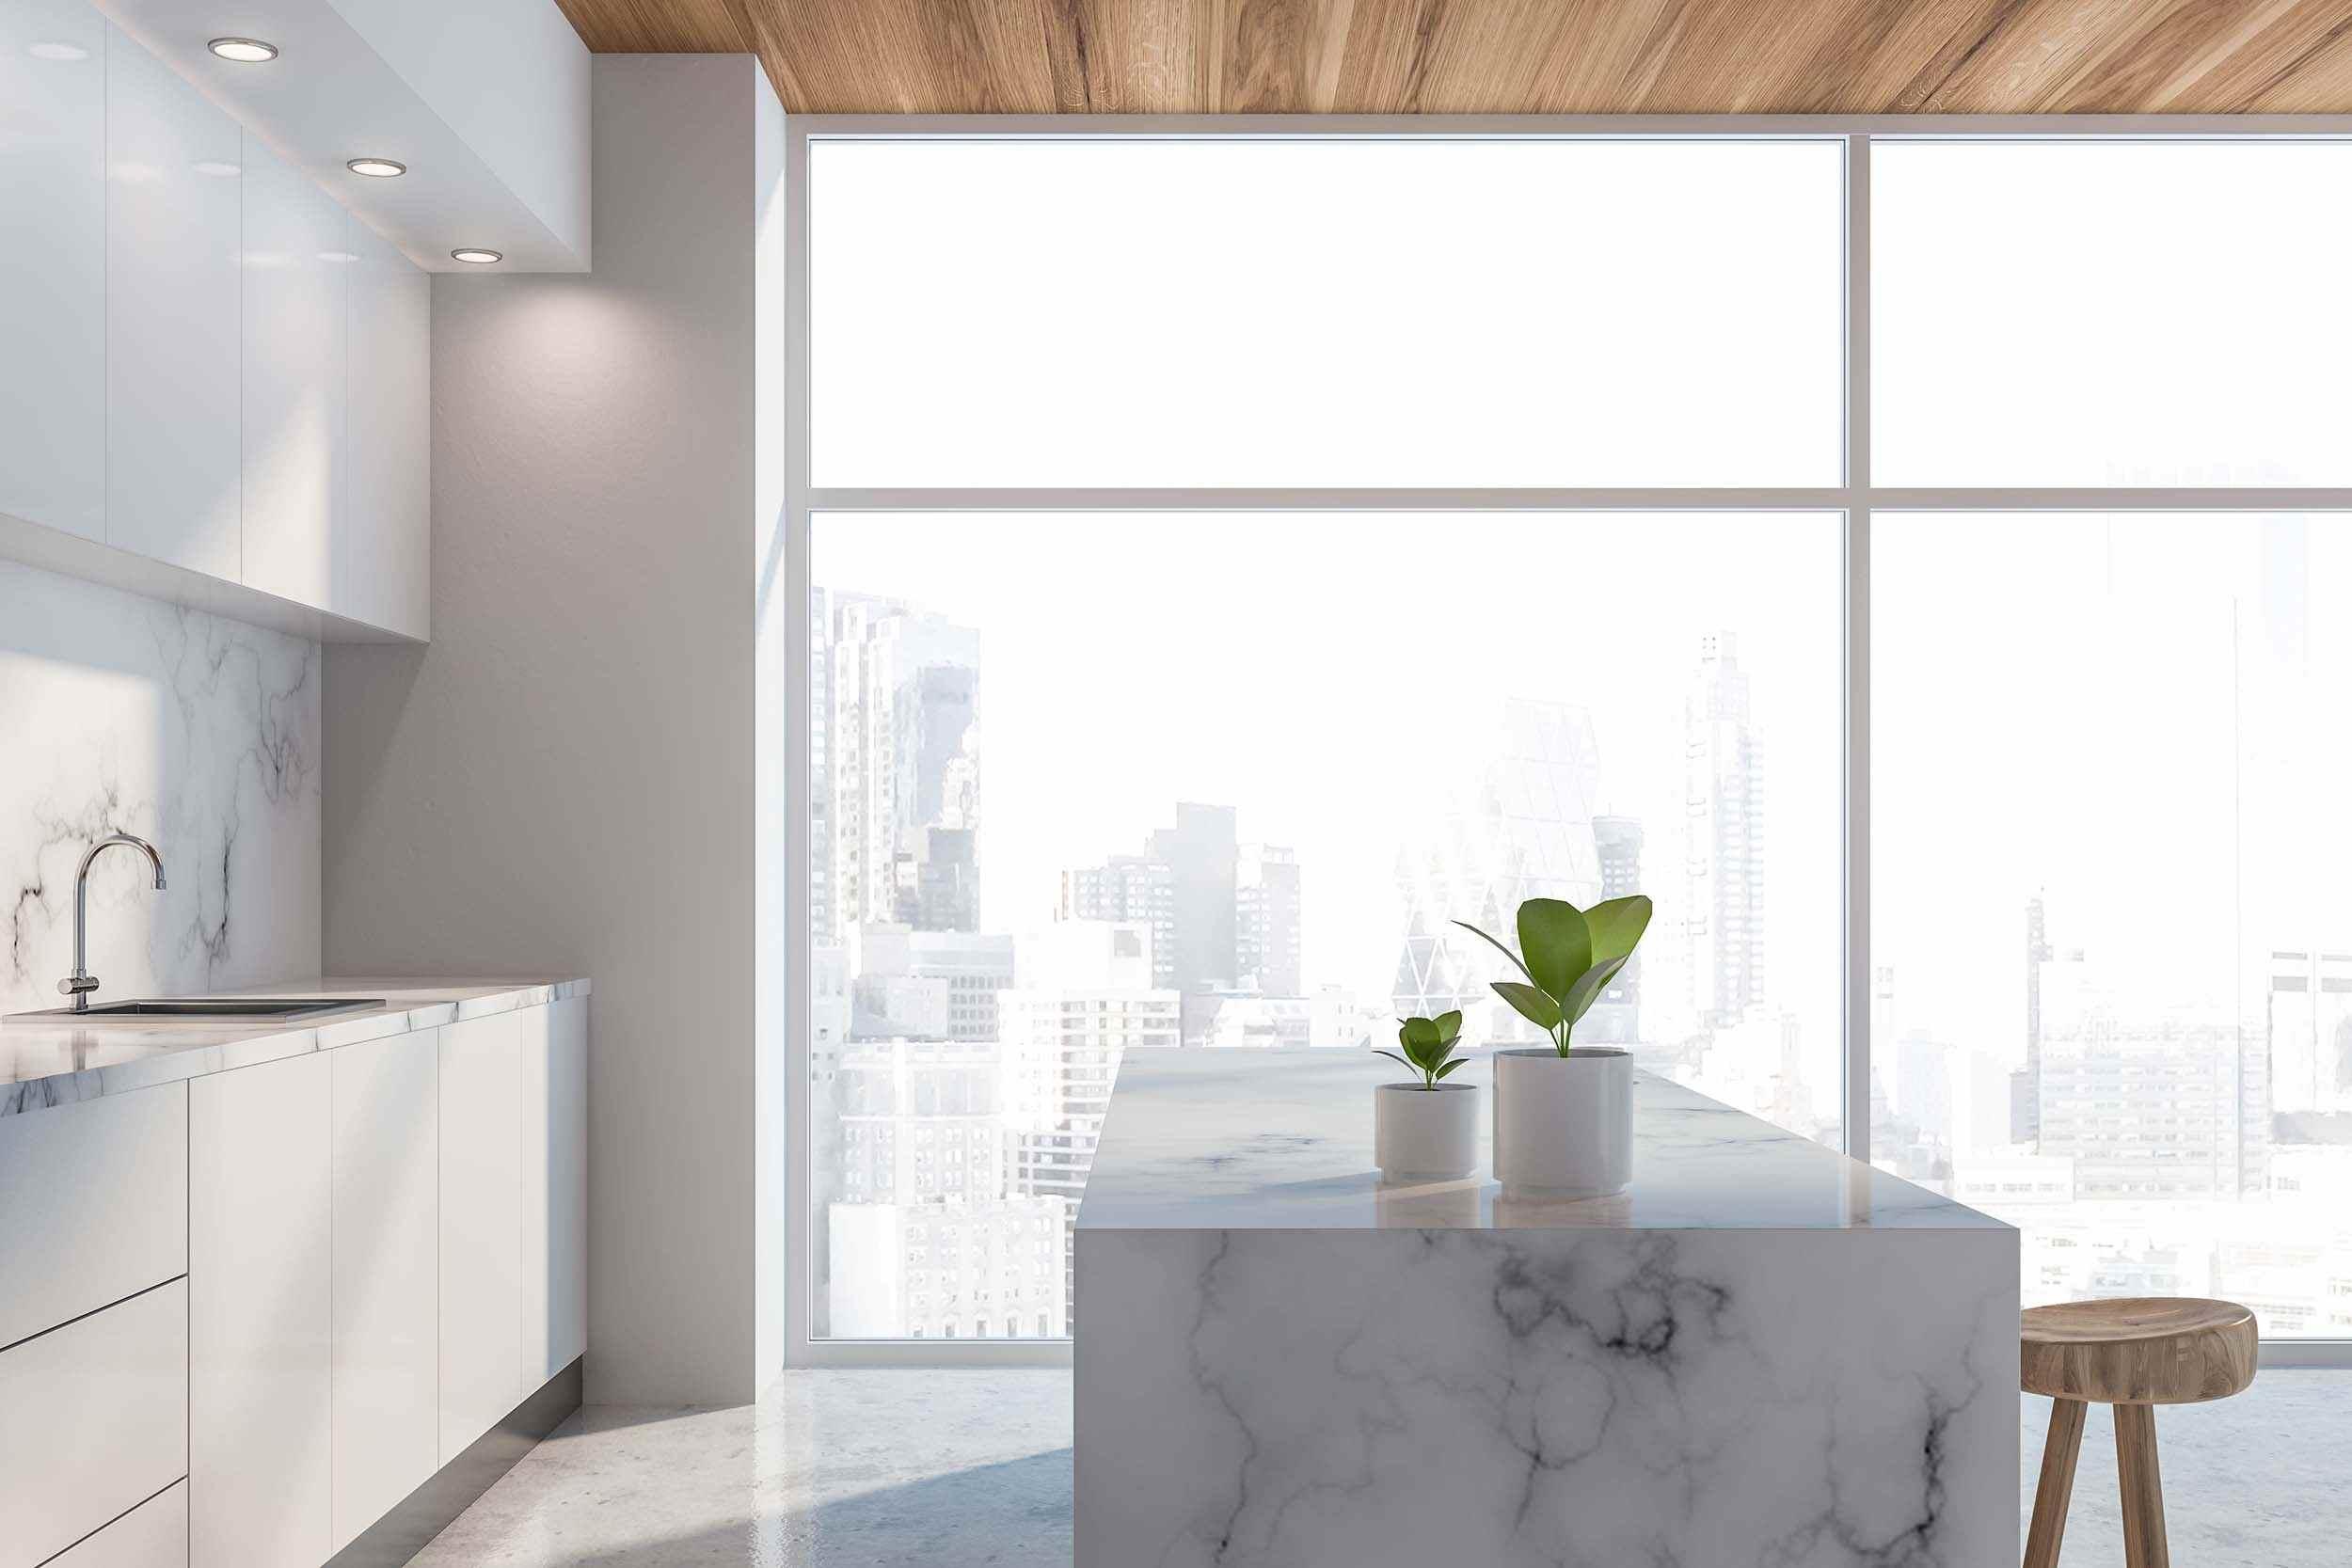 Luxurious Kitchen Countertop | Oasis Kitchen Cabinets